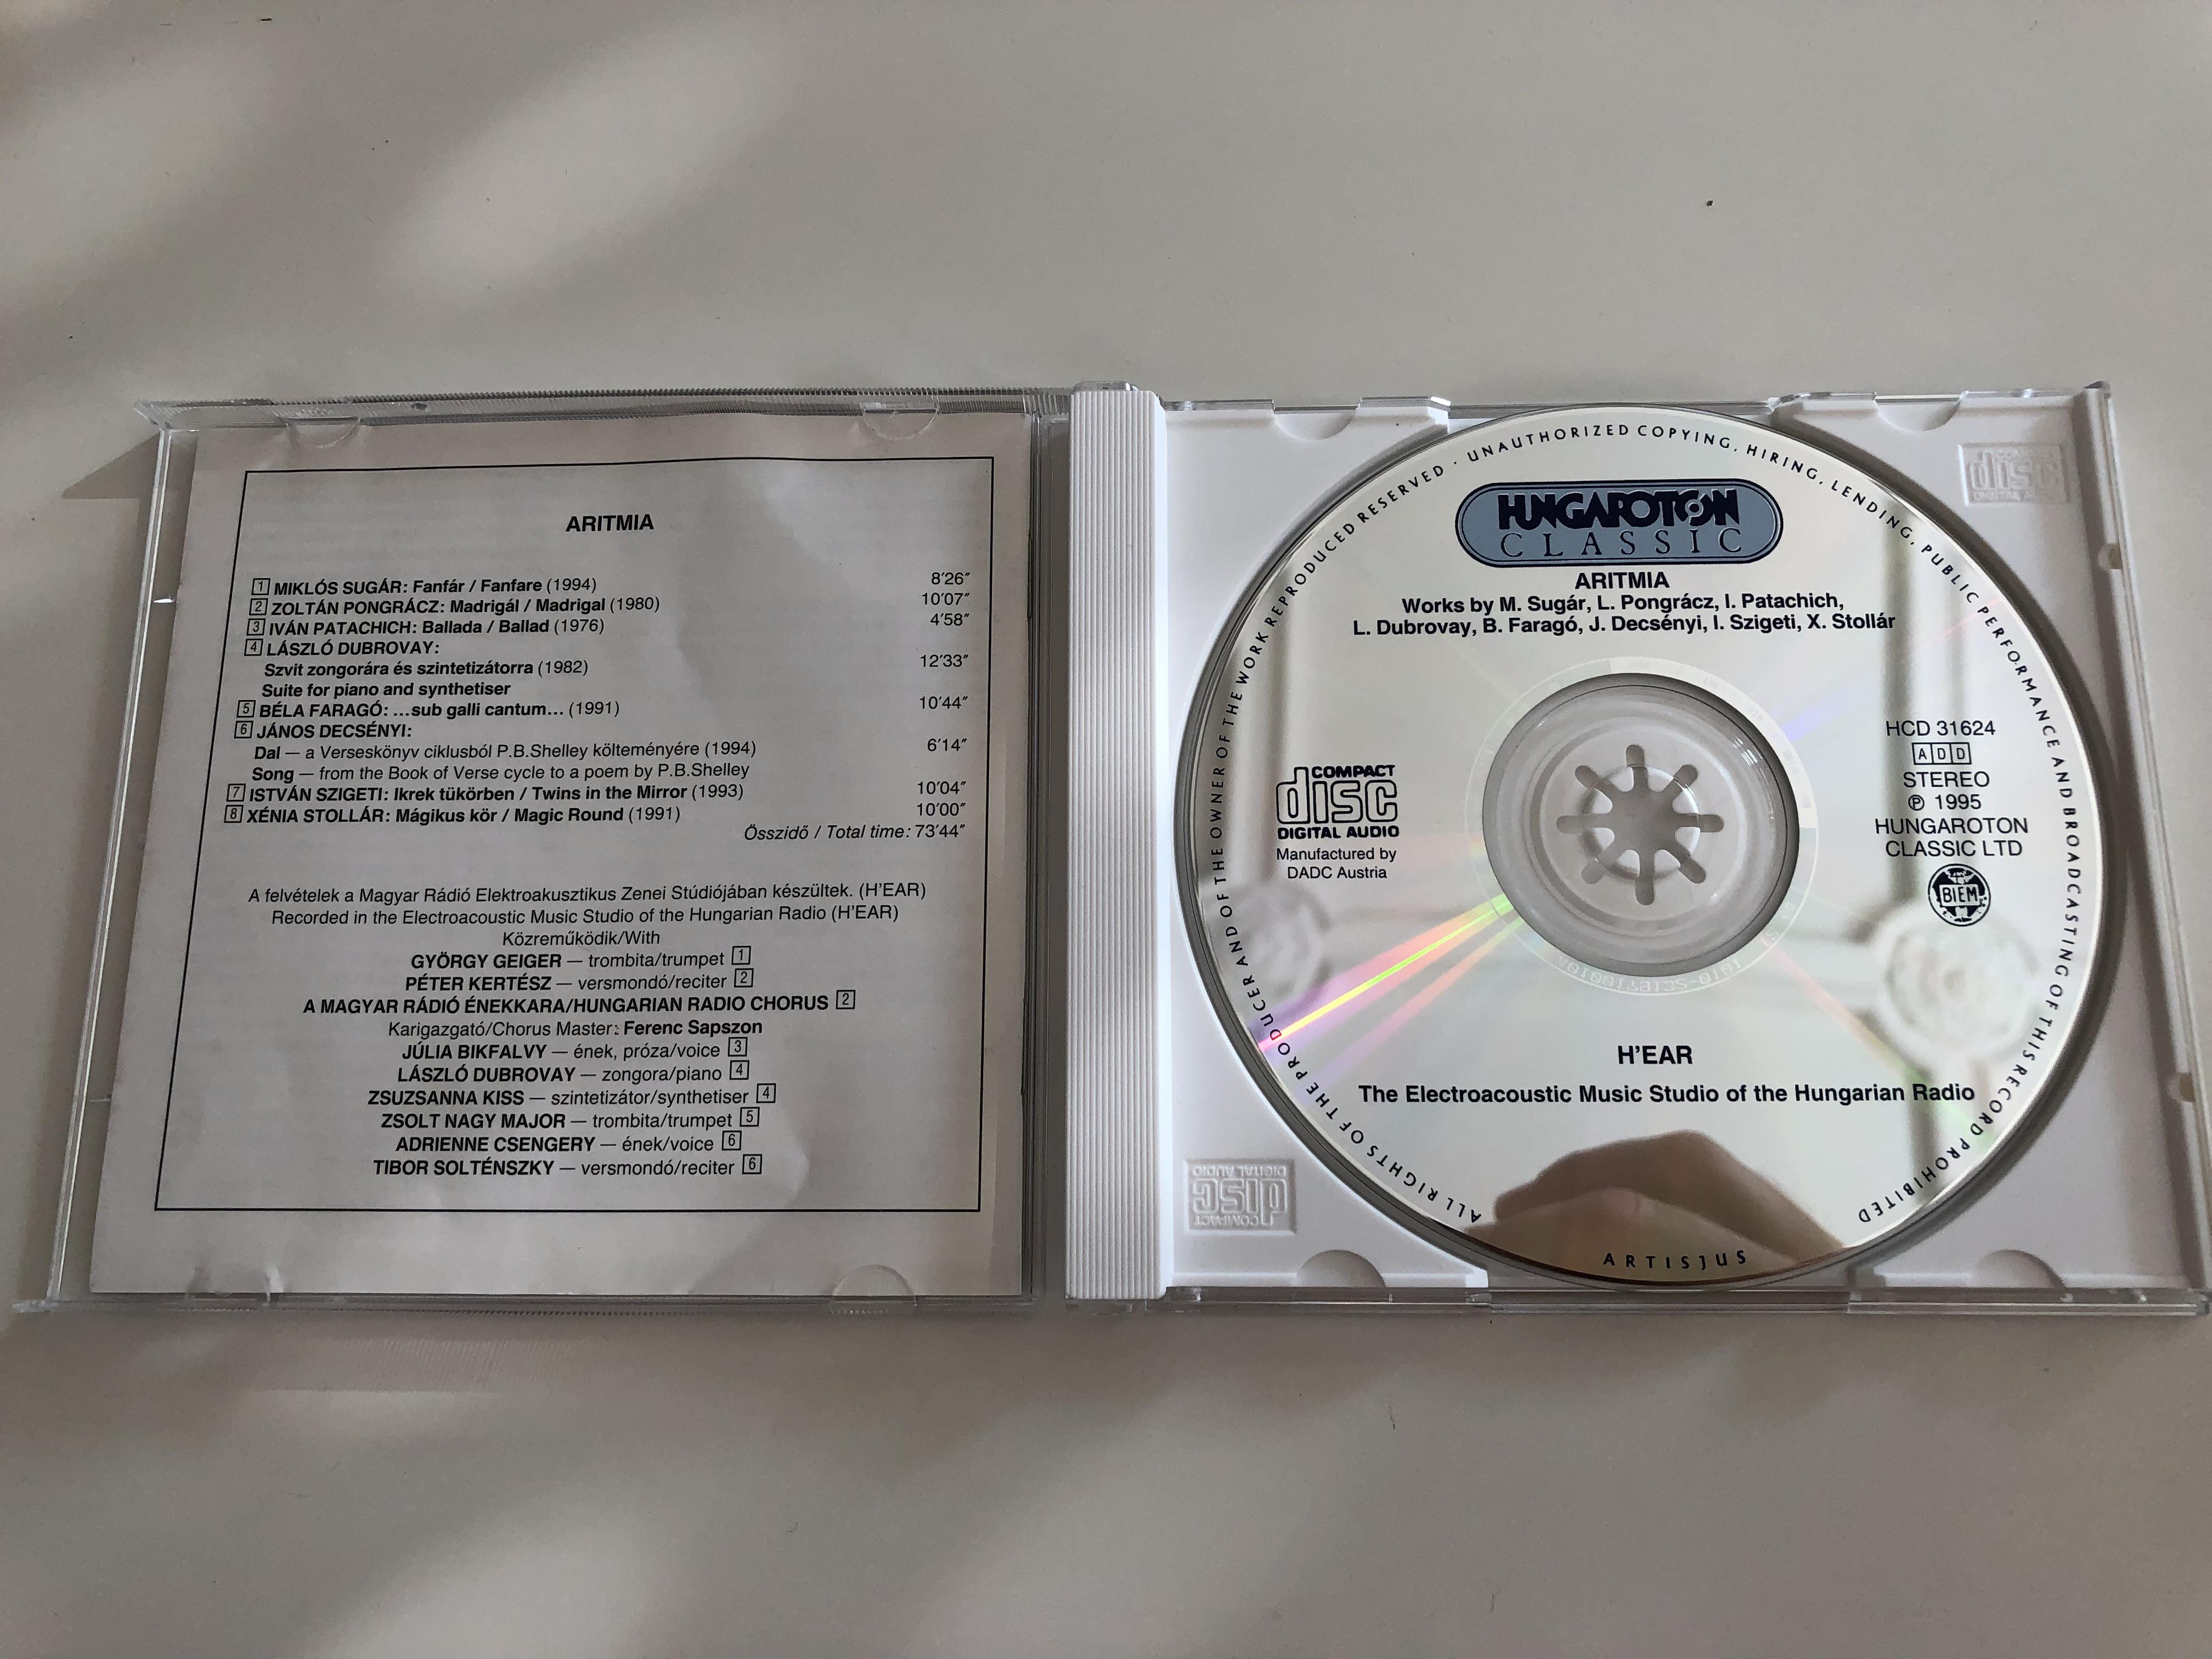 aritmia-works-by-mikl-s-sug-r-zolt-n-pongr-cz-iv-n-patachich-l-szl-dubrovay-b-la-farag-j-nos-decs-nyi-istv-n-szigeti-x-nia-stoll-r-hungaroton-classic-magyar-r-di-audio-cd-1995-hcd-31624-5-.jpg